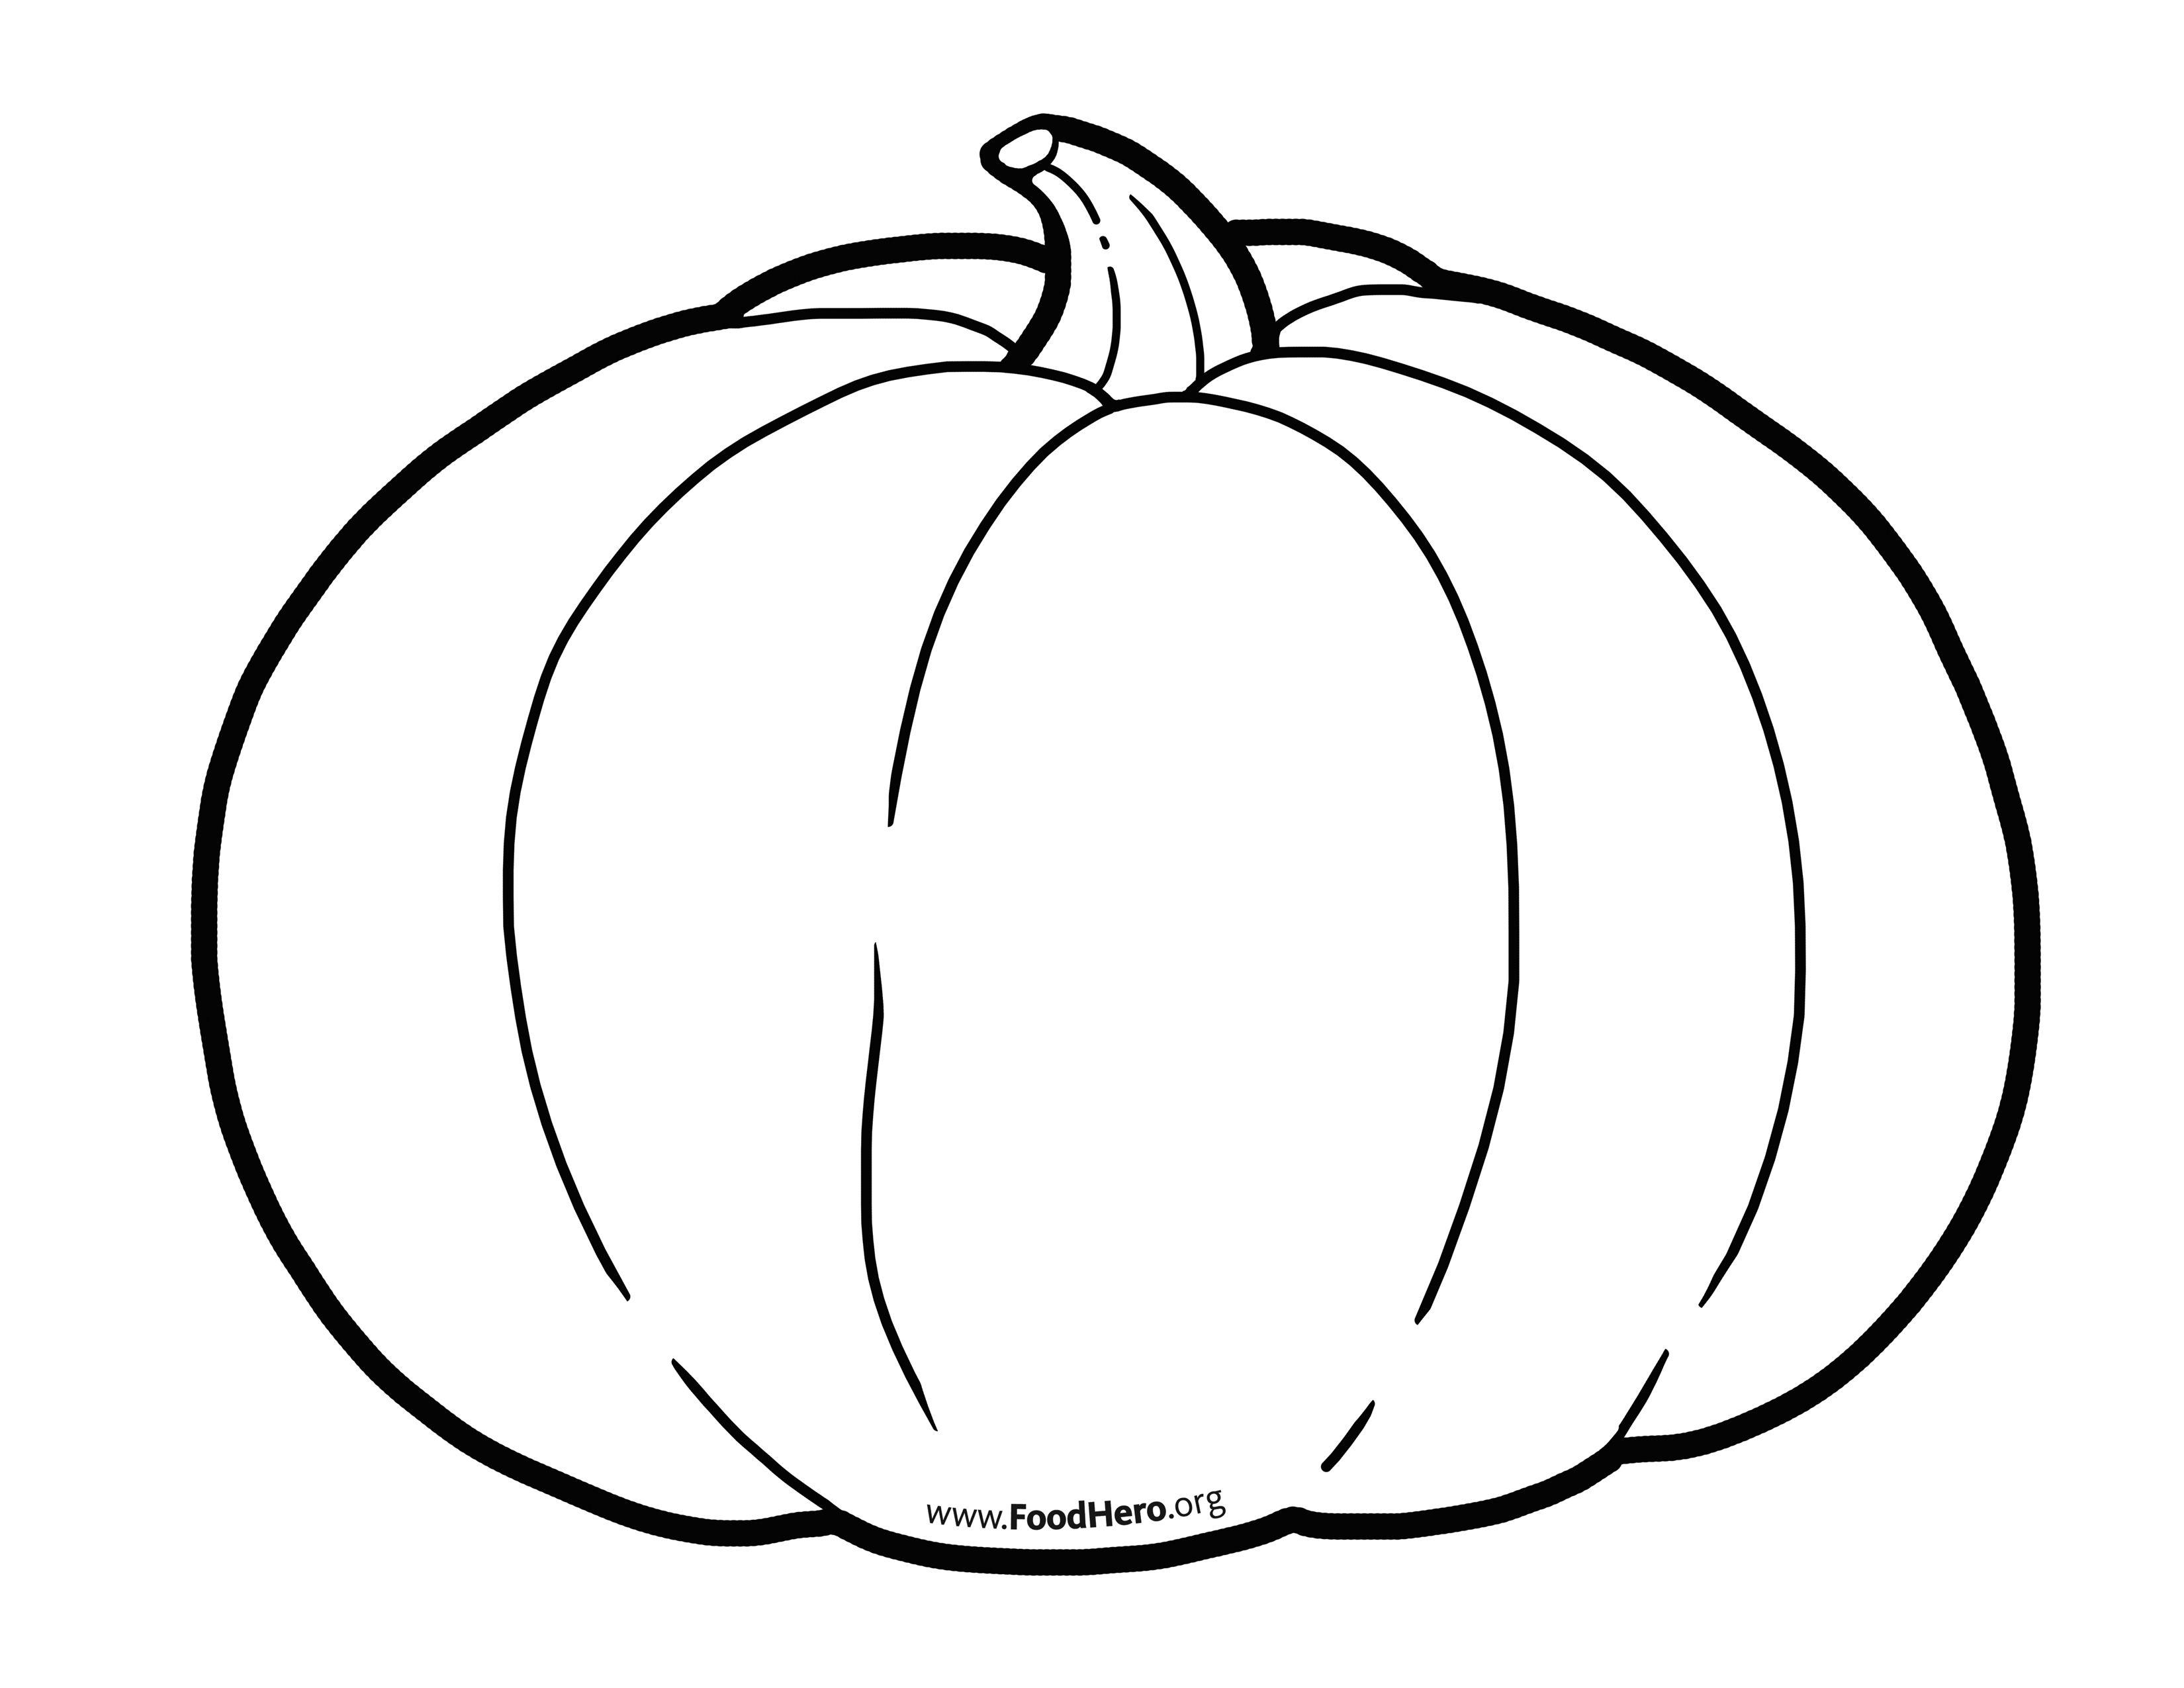 Pumpkin Illustration Foodhero Outline Bullentinboards Pumpkin Fruit Coloring Pages Pumpkin Art Pumpkin Illustration